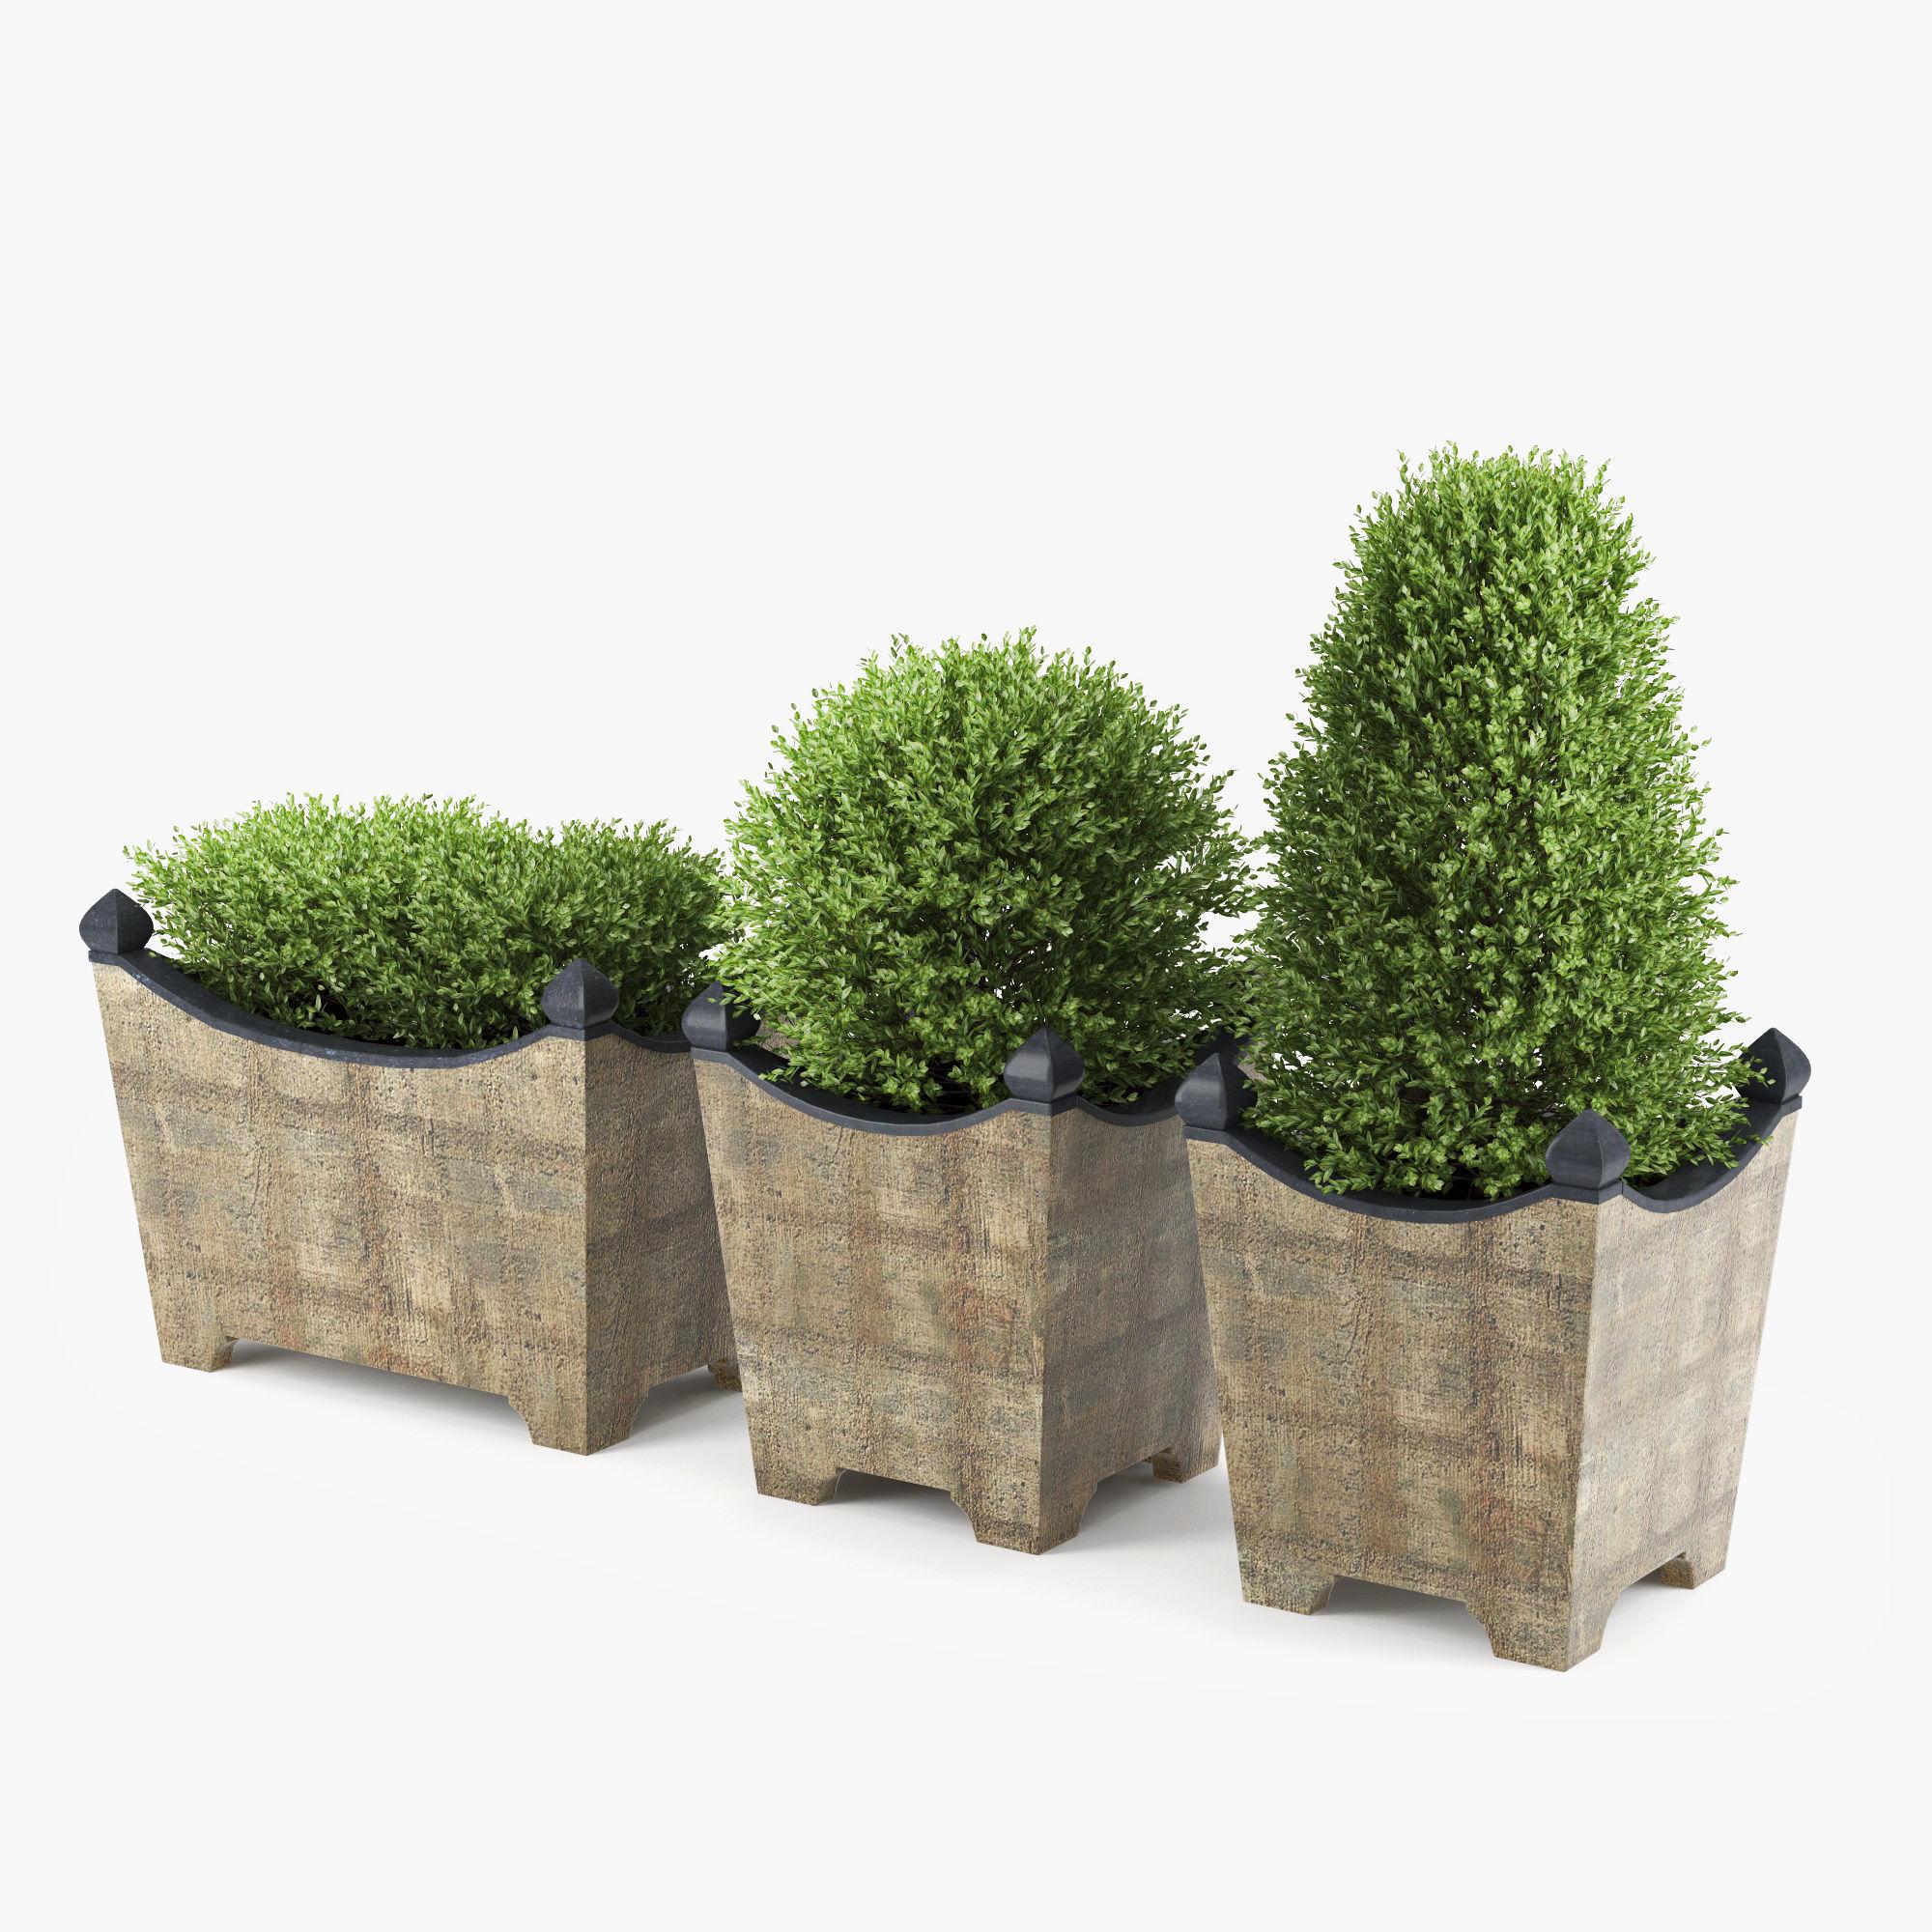 Boxwood Topiary 3d Cgtrader